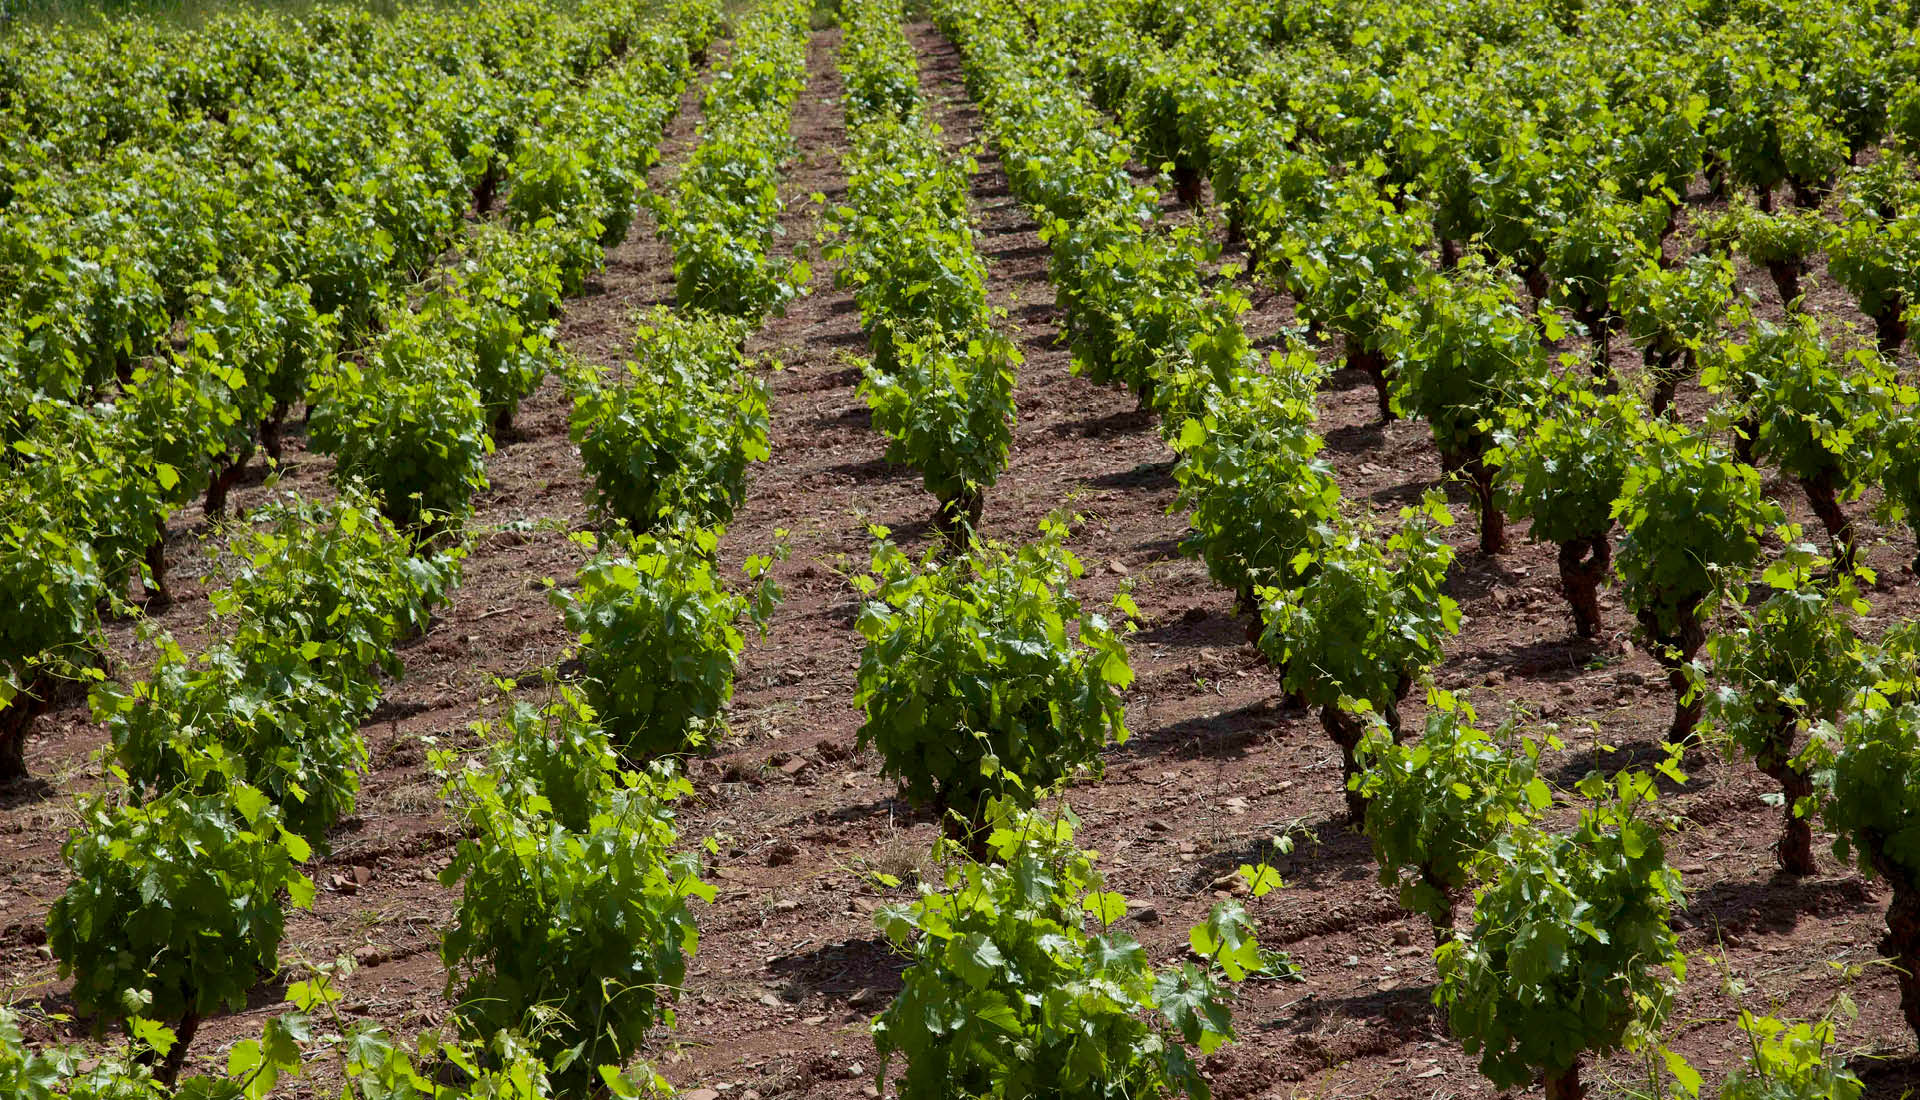 Cultures viticoles Grand Site Salagou © L.Micola 4